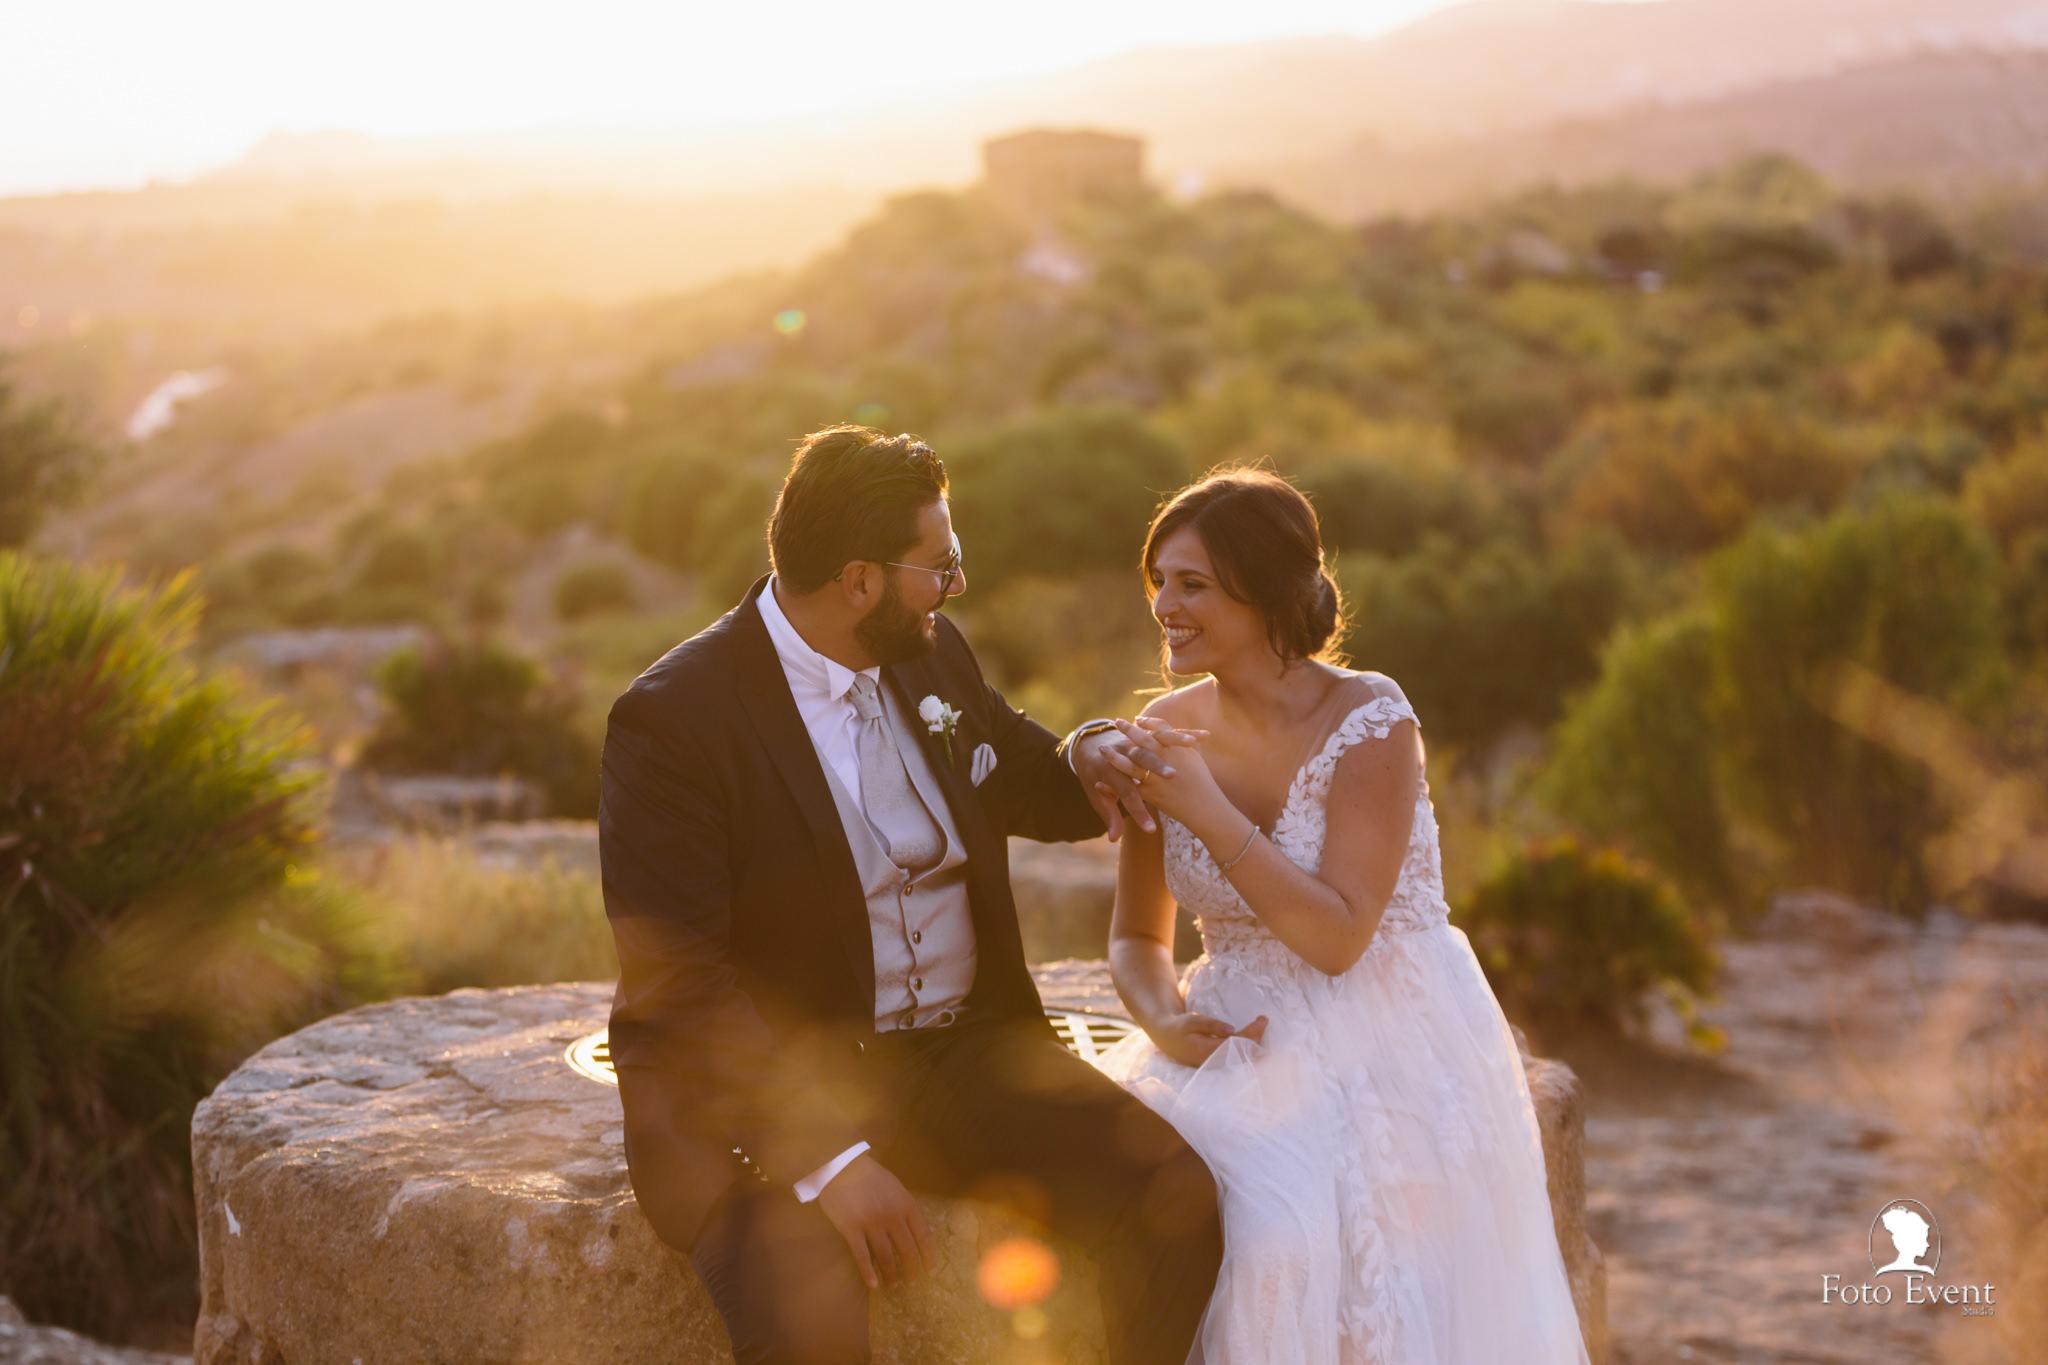 033-2019-09-09-Matrimonio-Dorotea-e-Alberto-Iemmolo-zoom-544